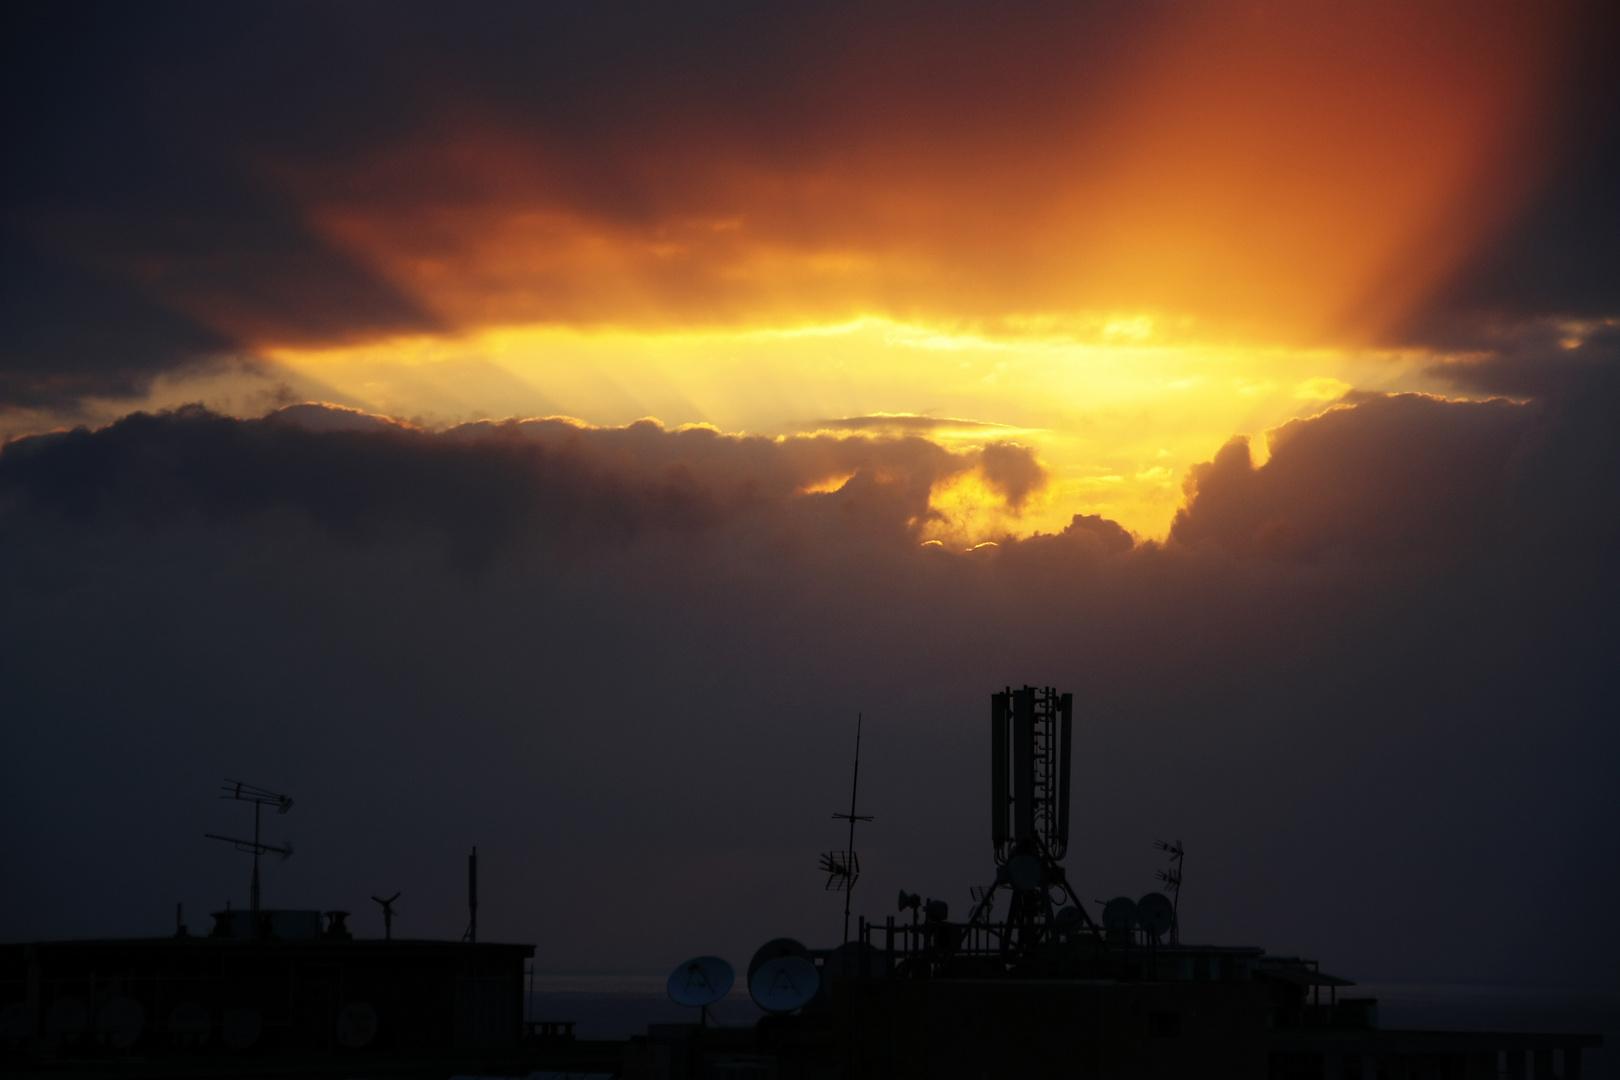 Puerto de la Cruz - Sonnenuntergang Mai 2011